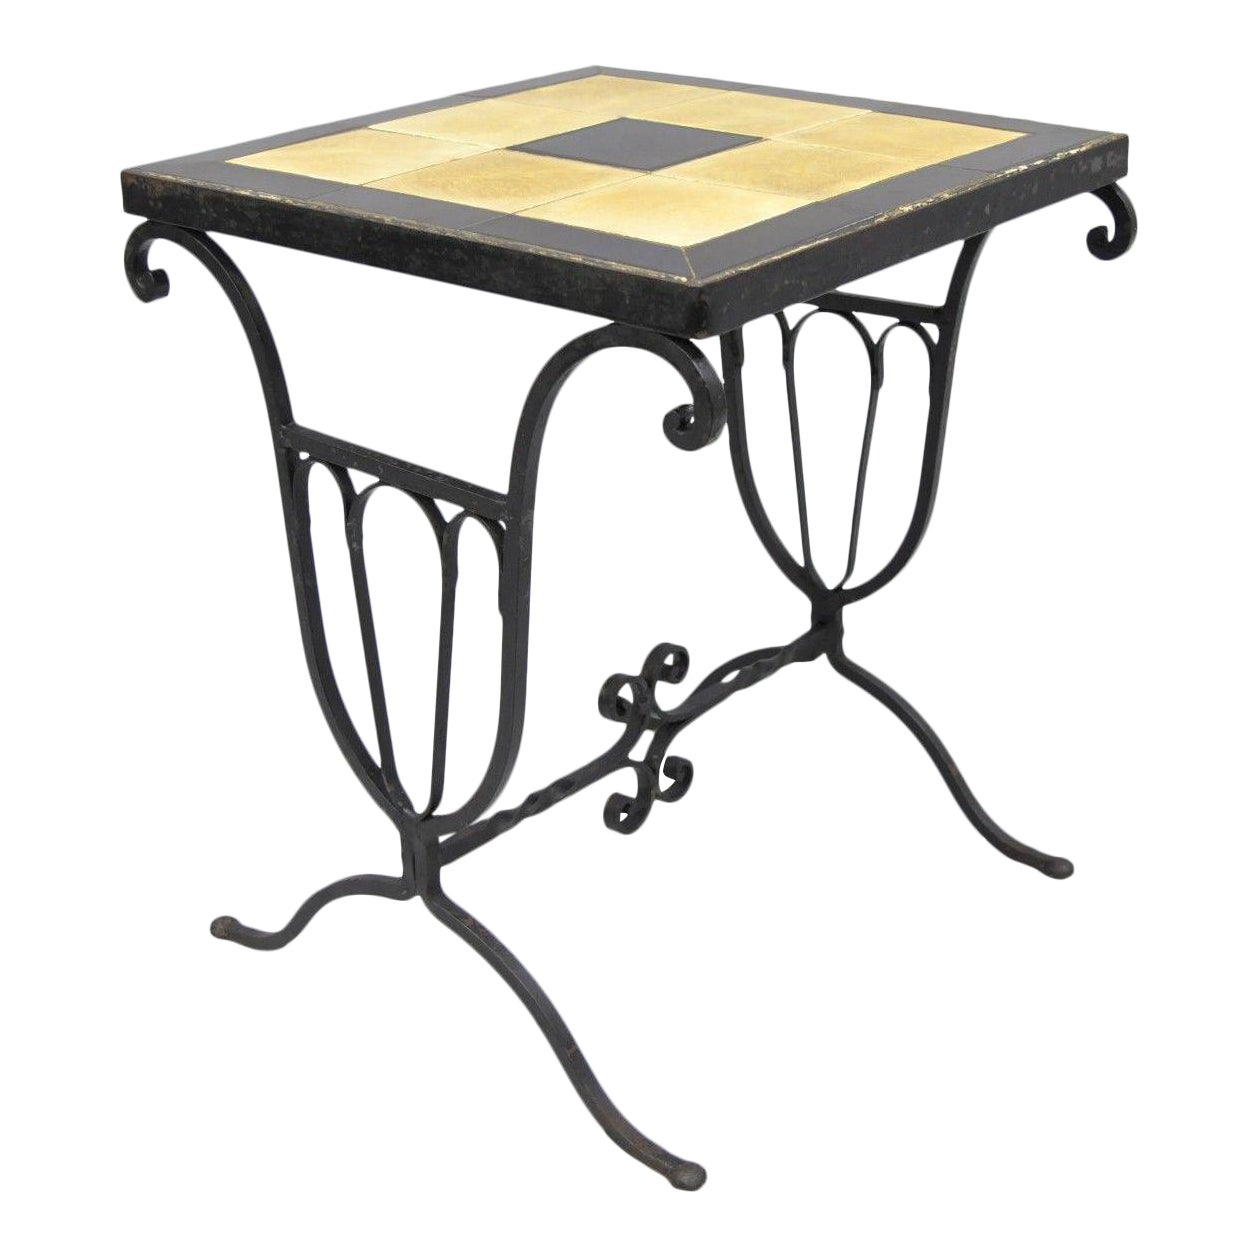 Art Nouveau Wrought Iron Metal Ceramic Tile Top Small Side Table